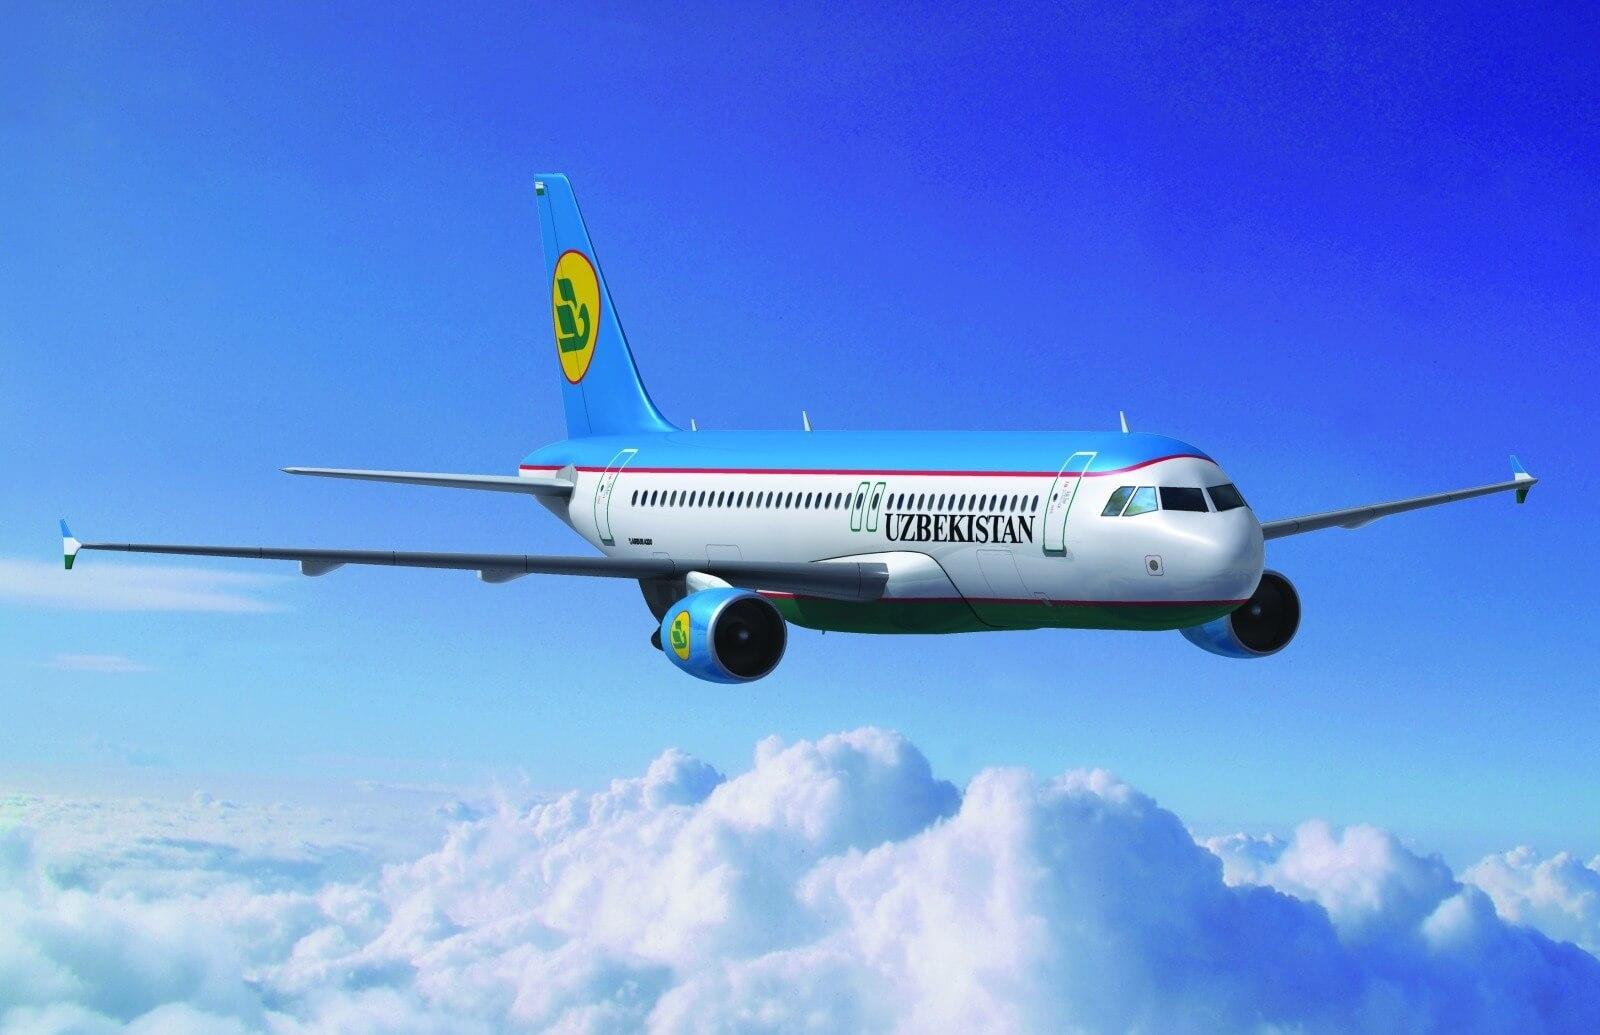 """Uzbekistan airways"" ички қатновларга байрам чегирмаларини эълон қилди"